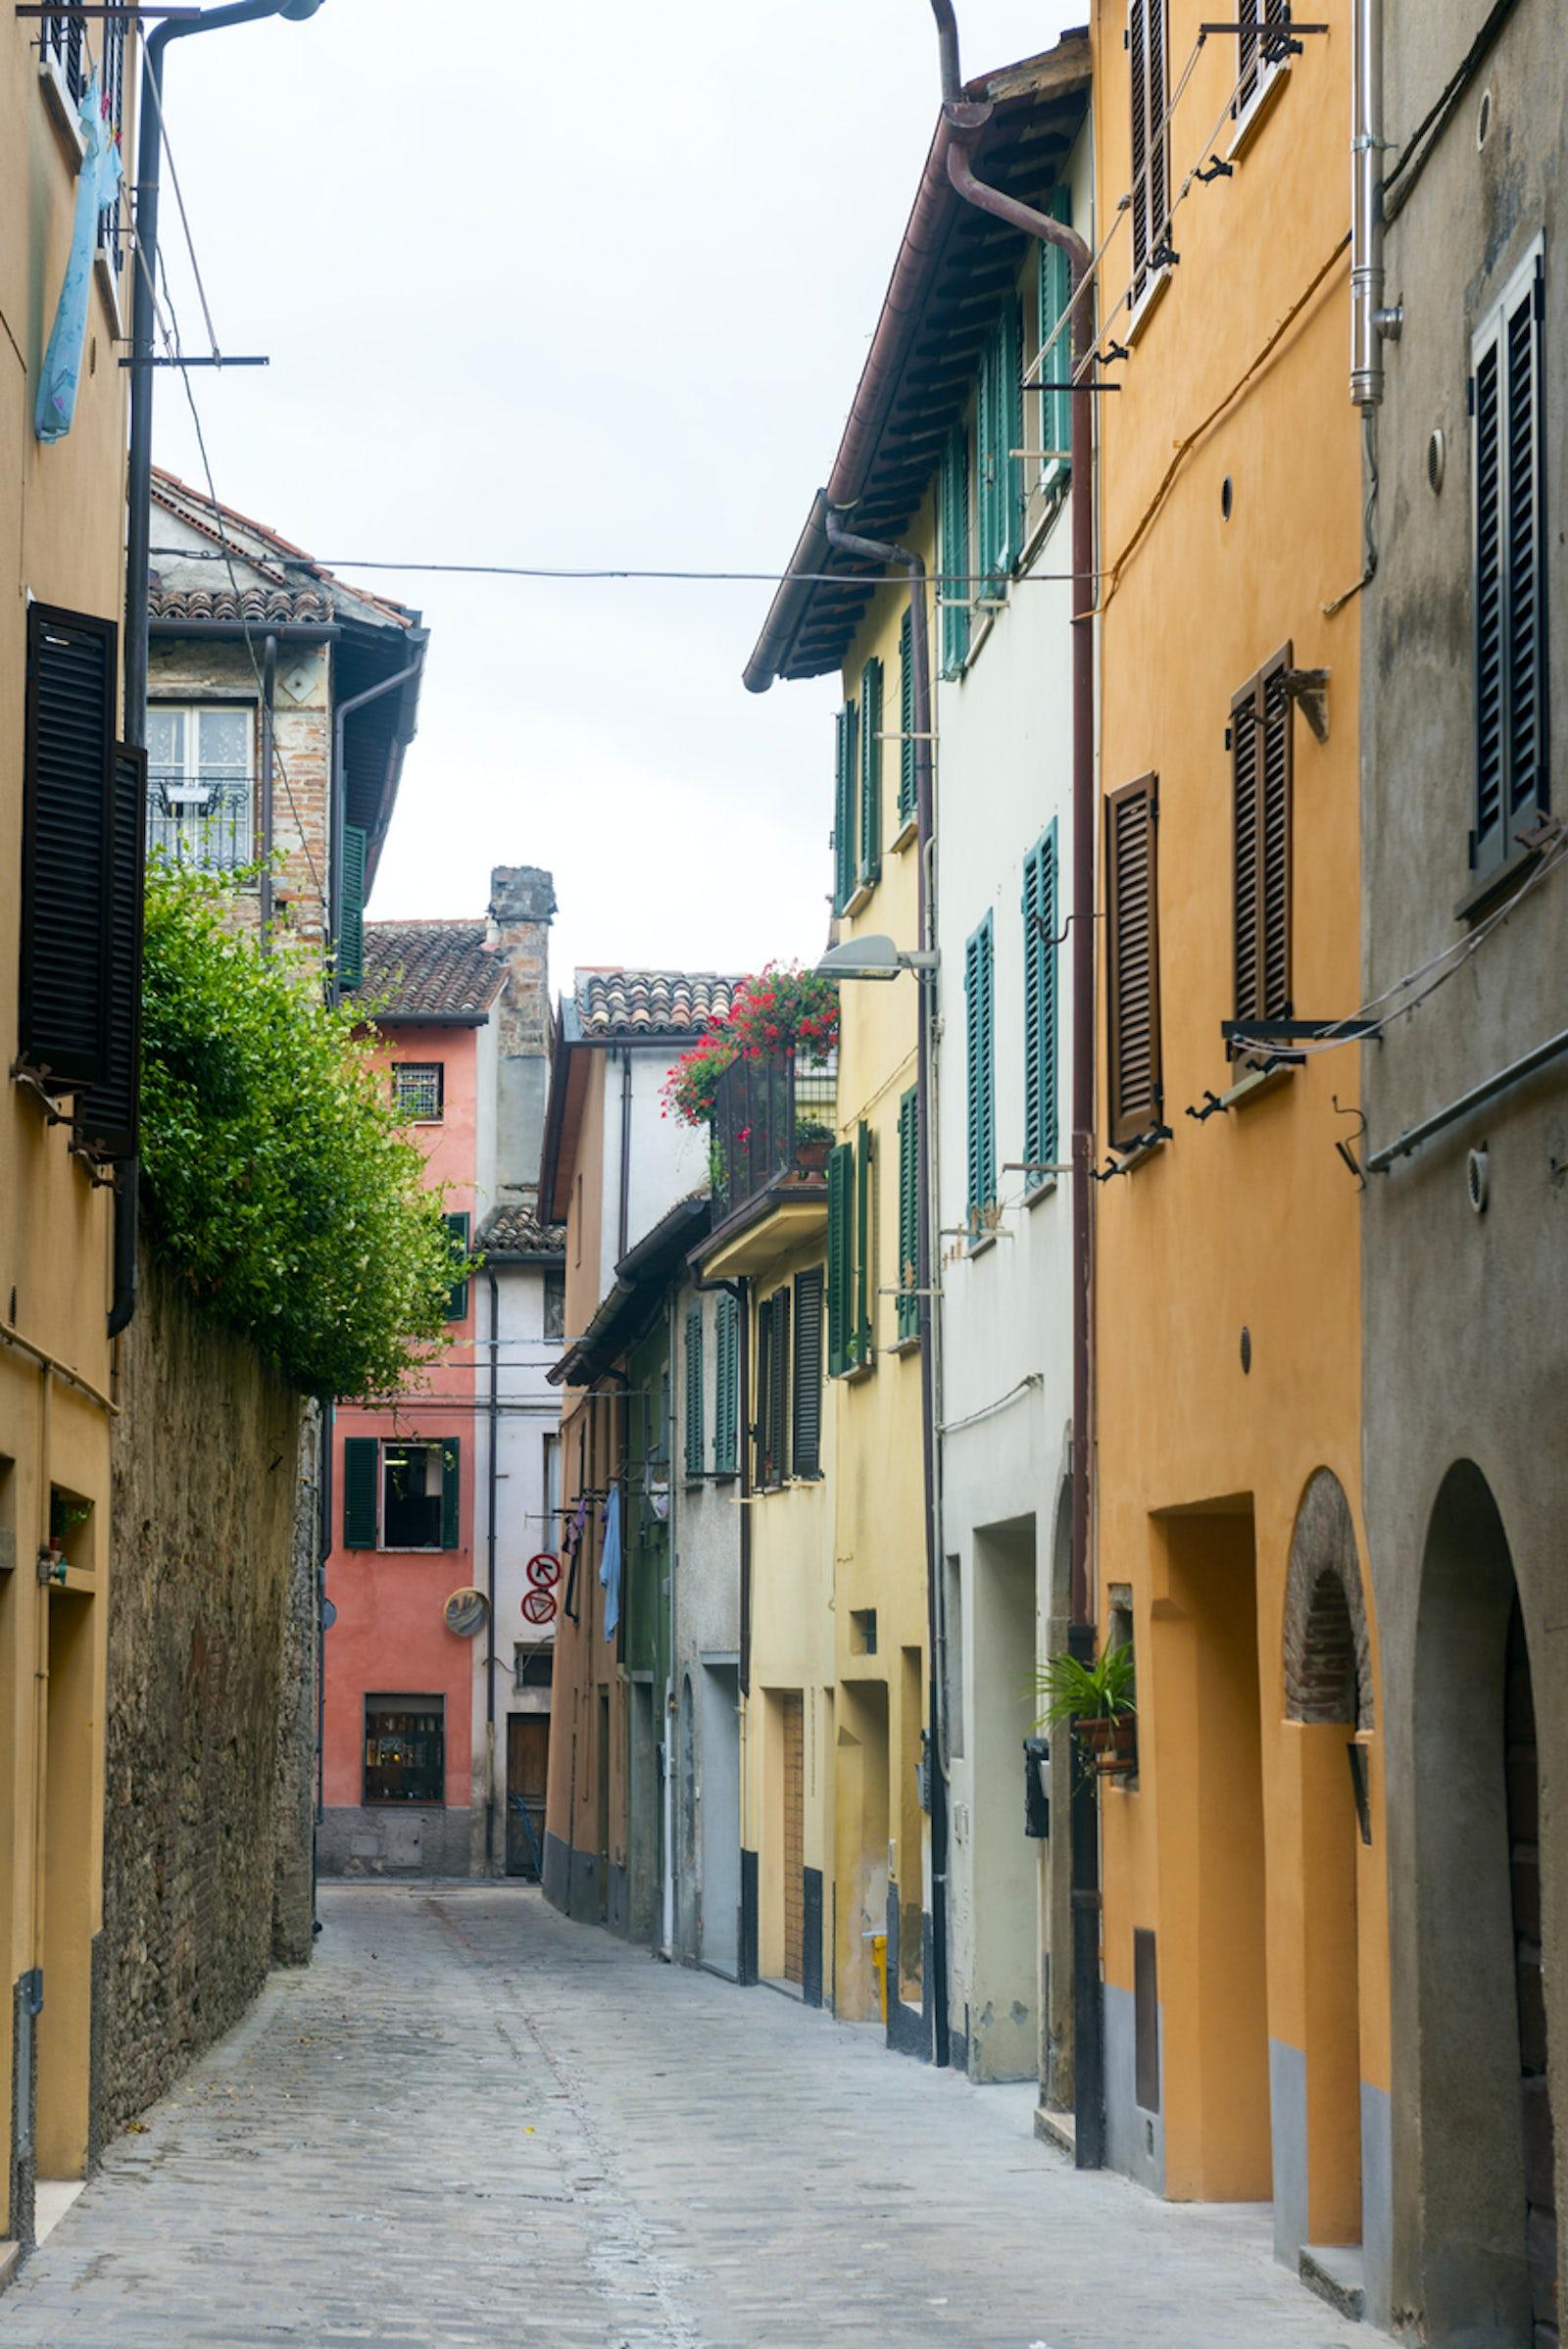 Cover picture credits© istockphoto.com/Clodio